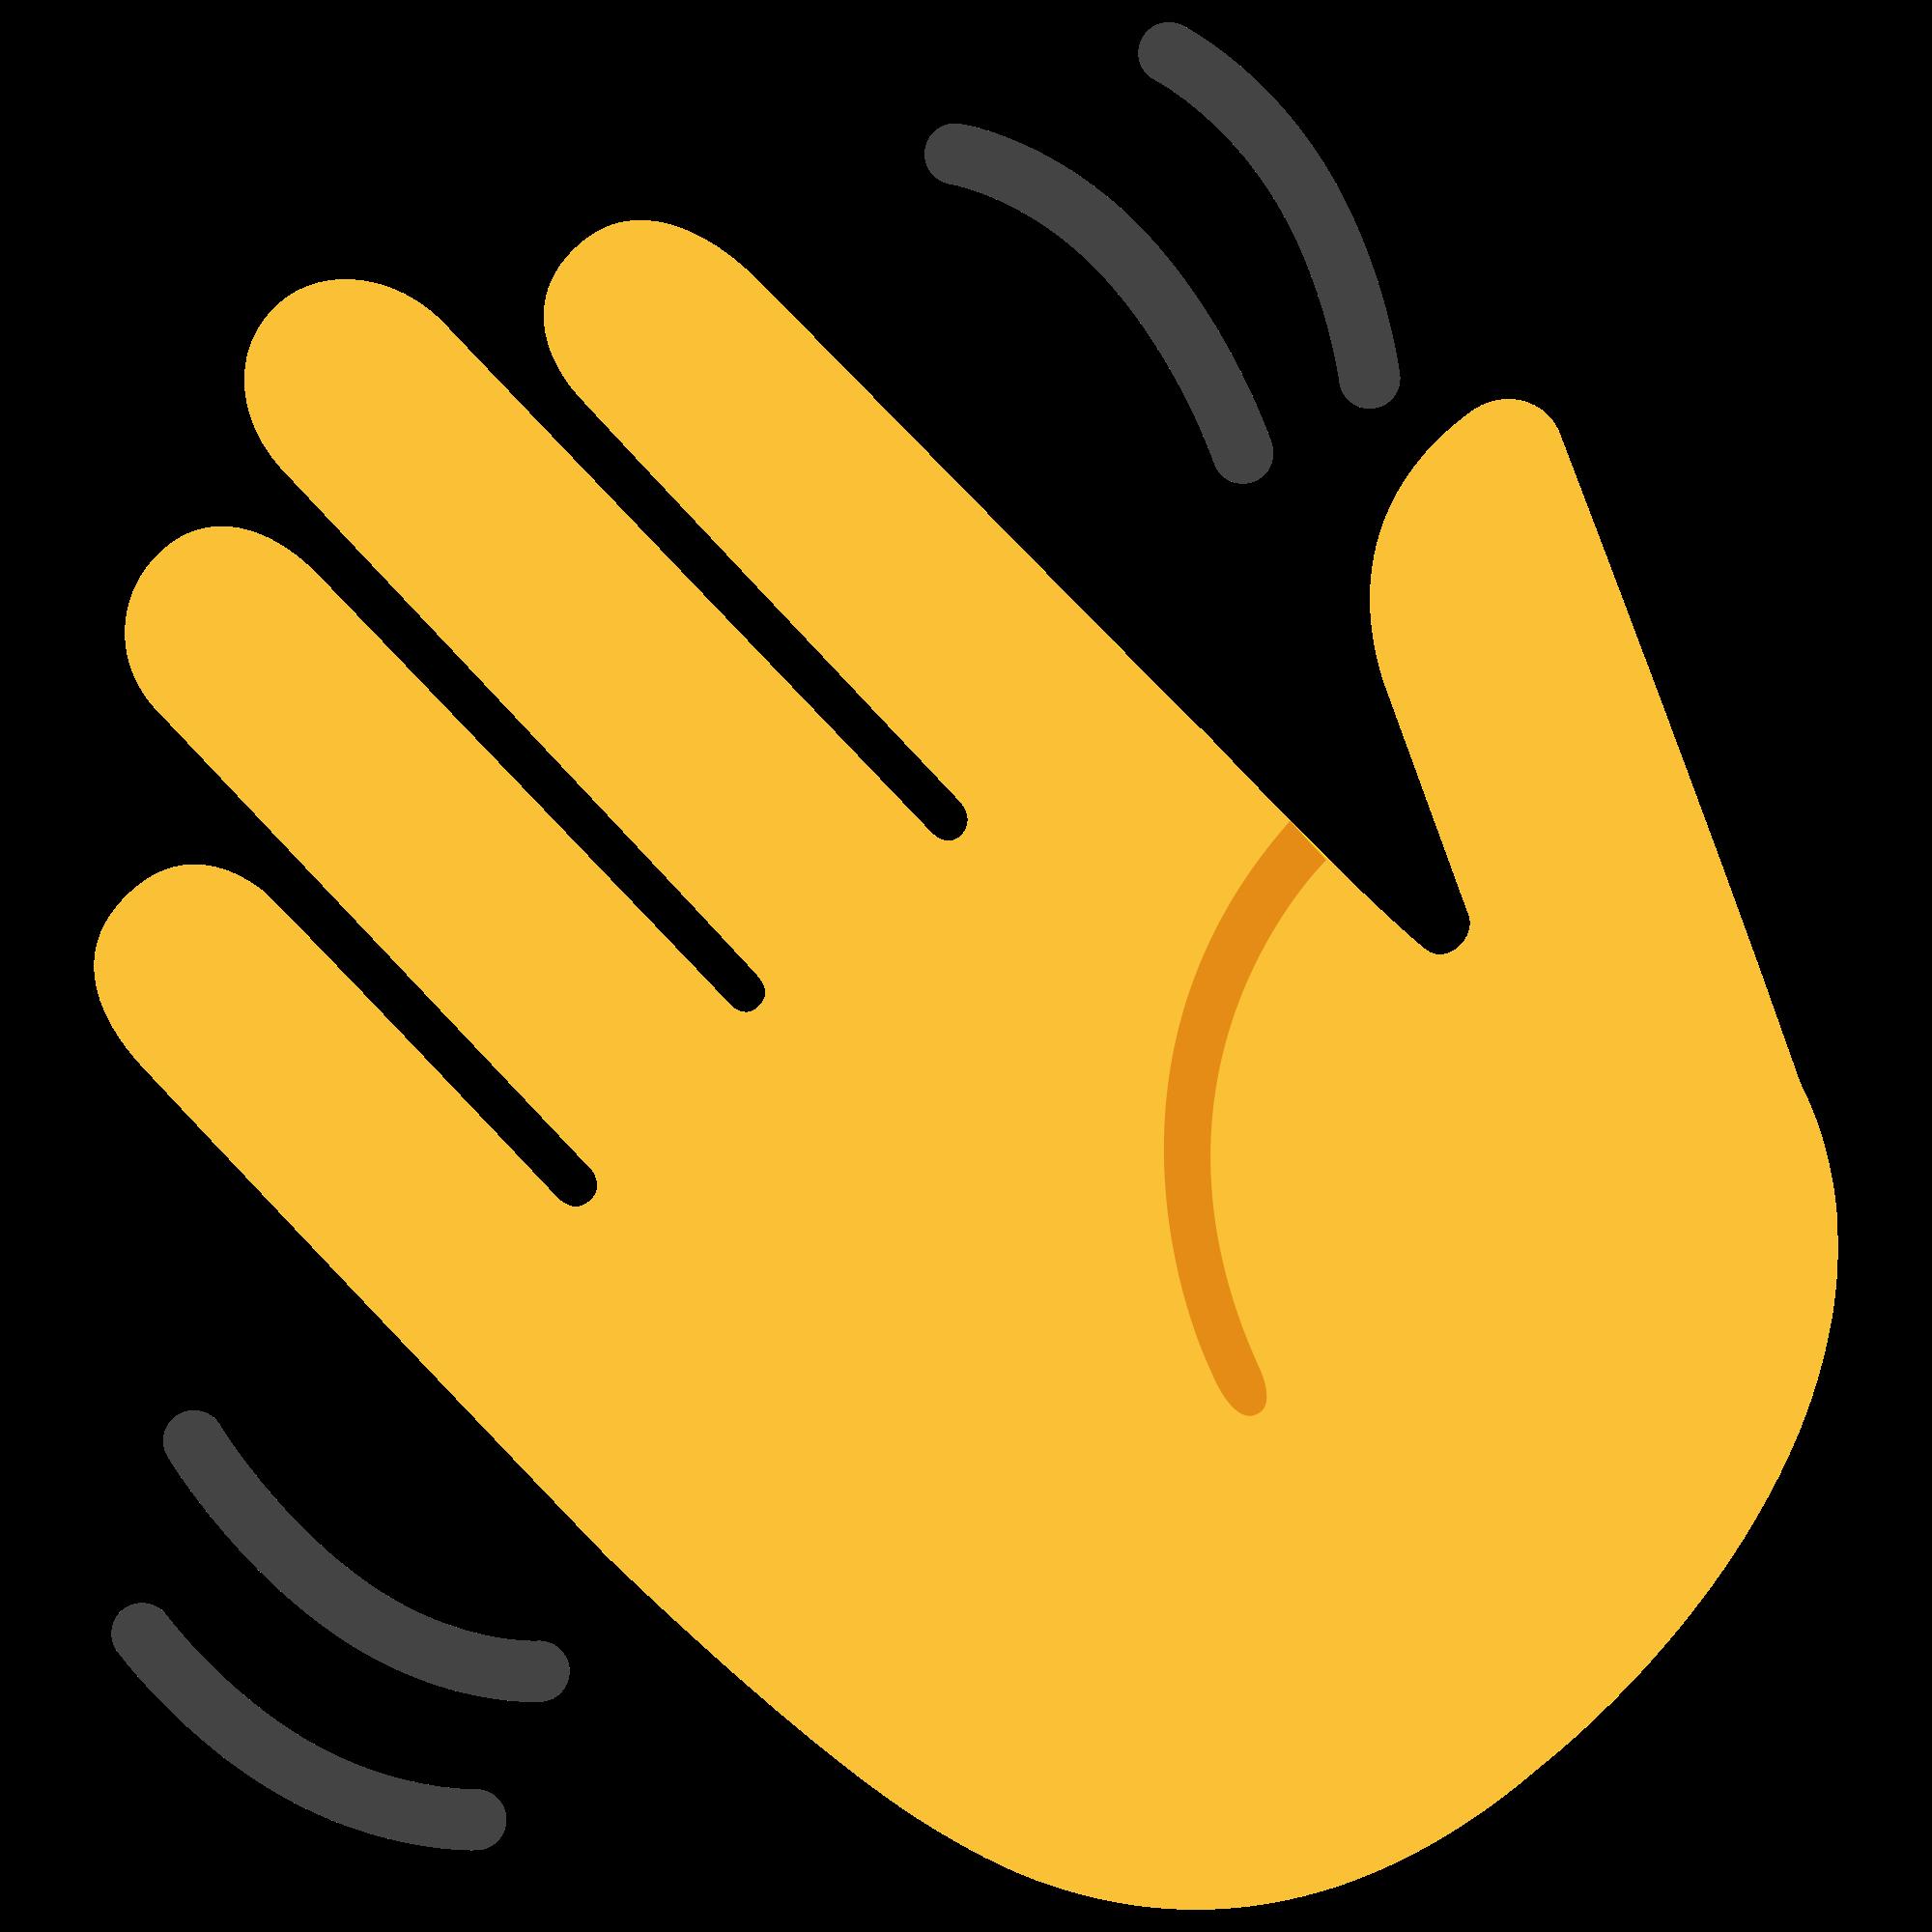 Goodbye hand clipart clip free Hand Waving Goodbye Clipart clip free